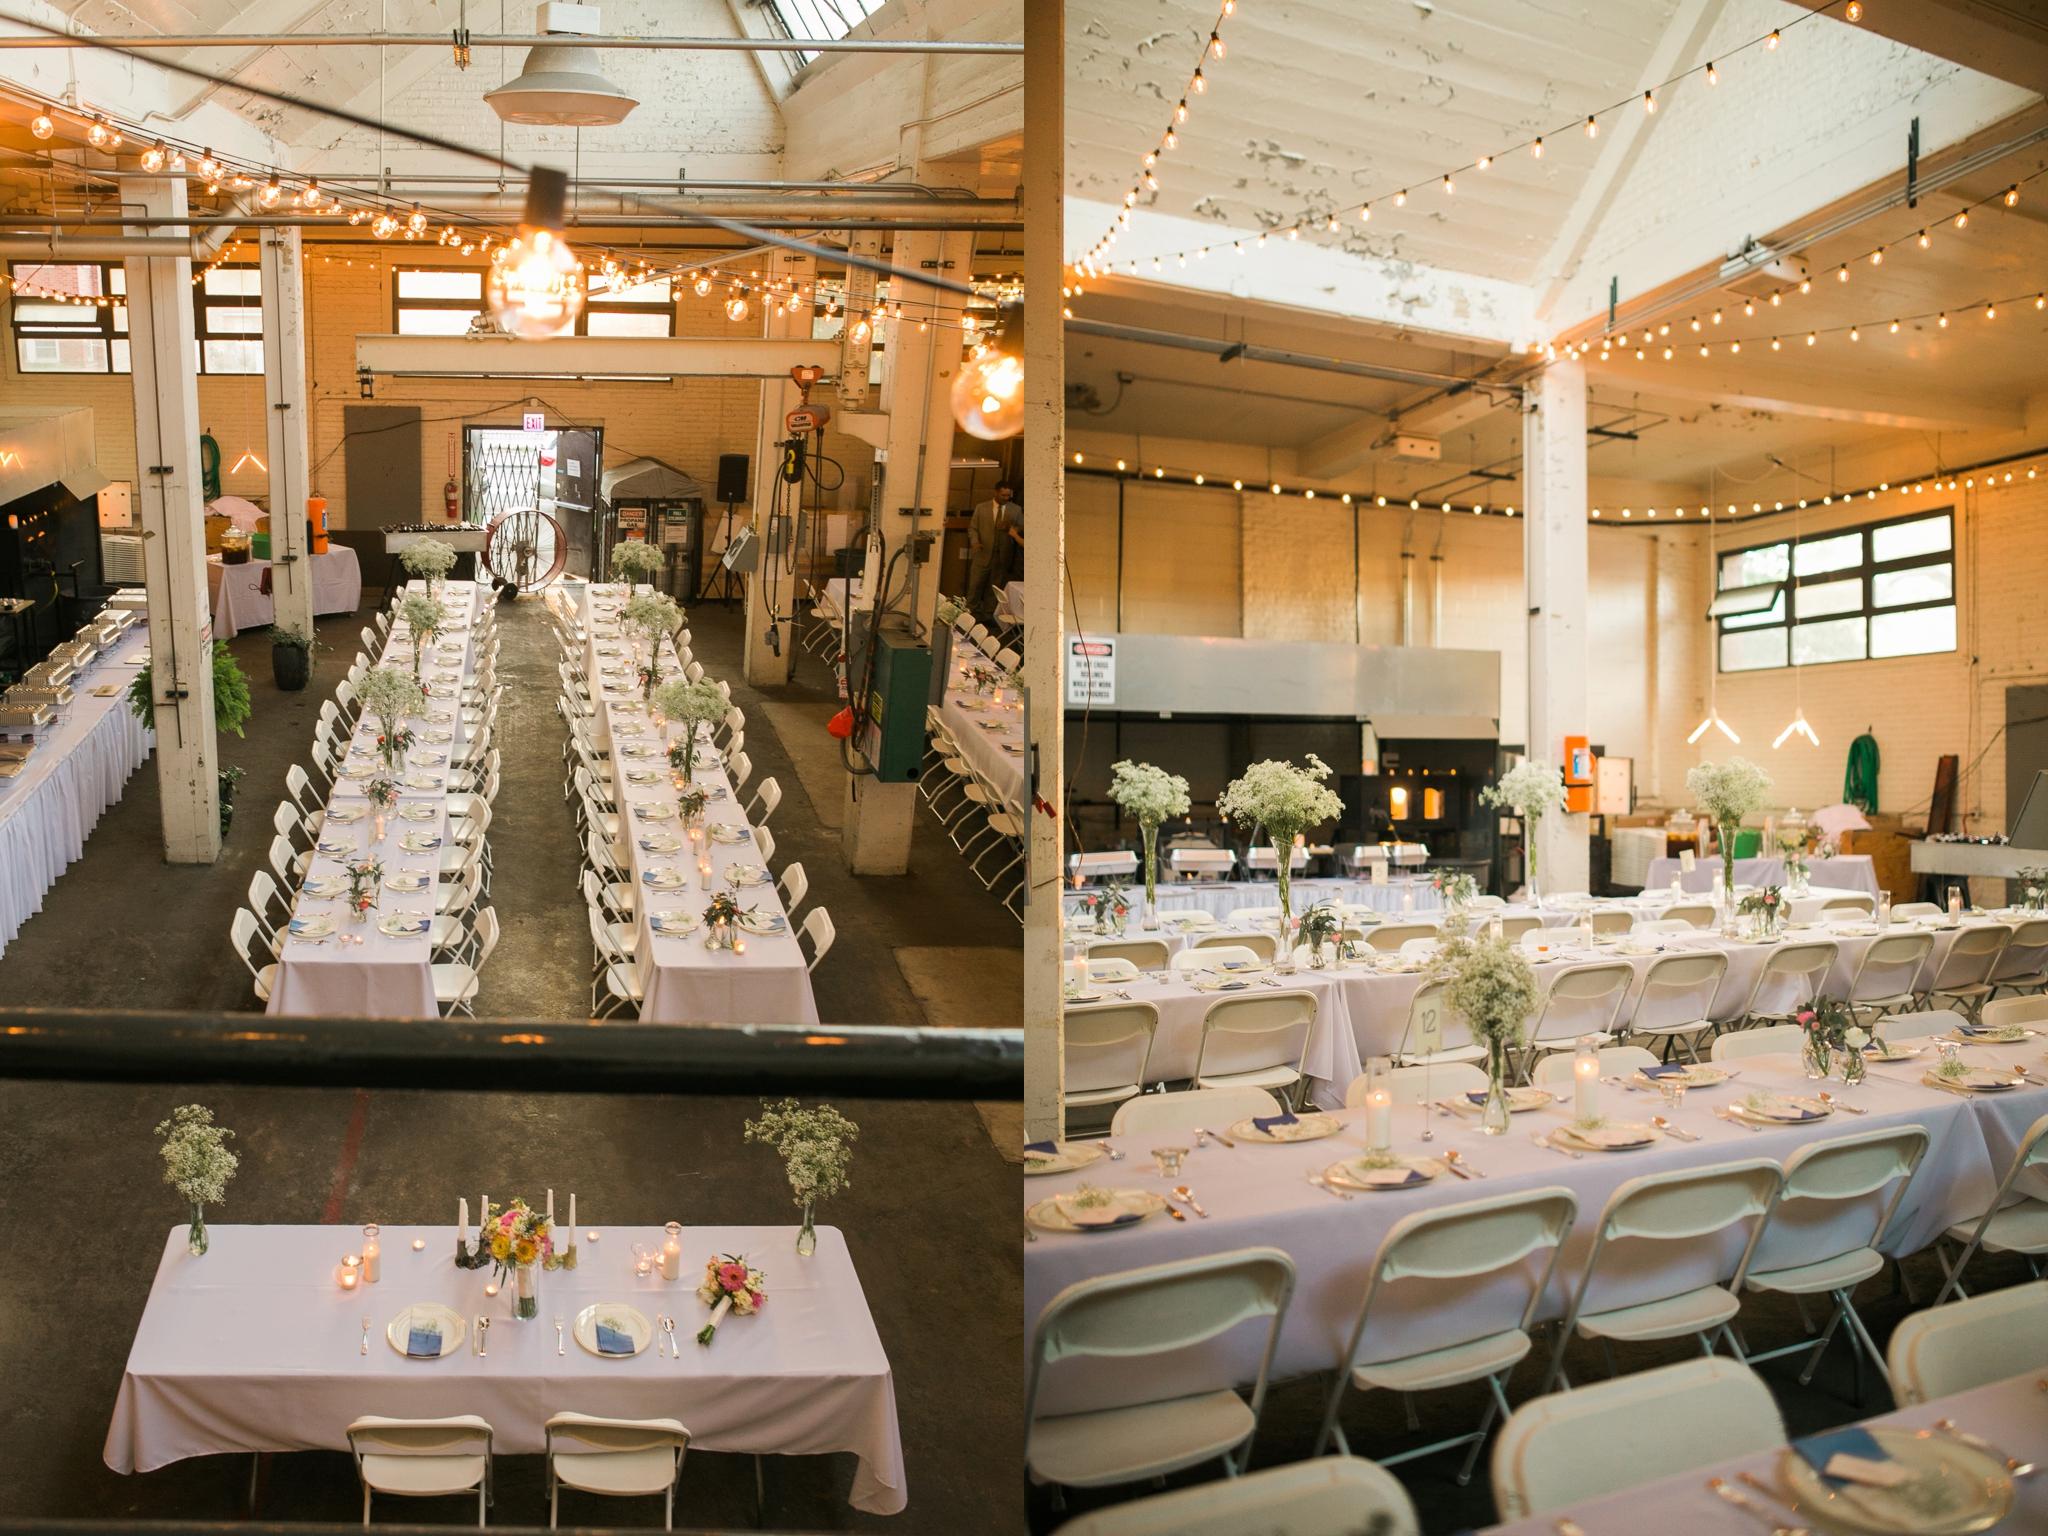 West-Supply-Foundry-Chicago-Wedding-156.jpg